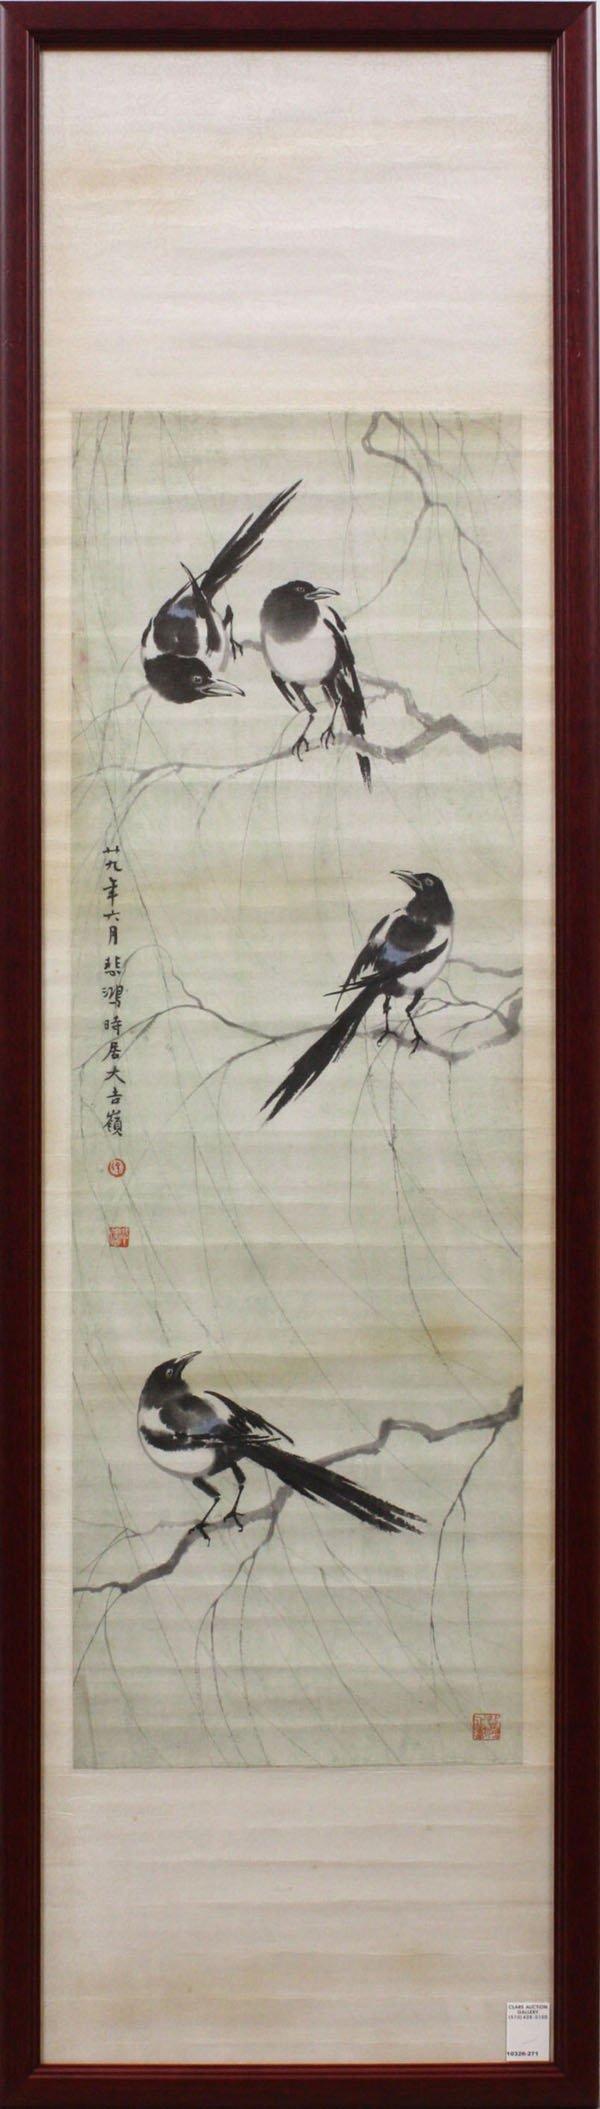 136: Chinese painting, Xu Beihong, Magpies